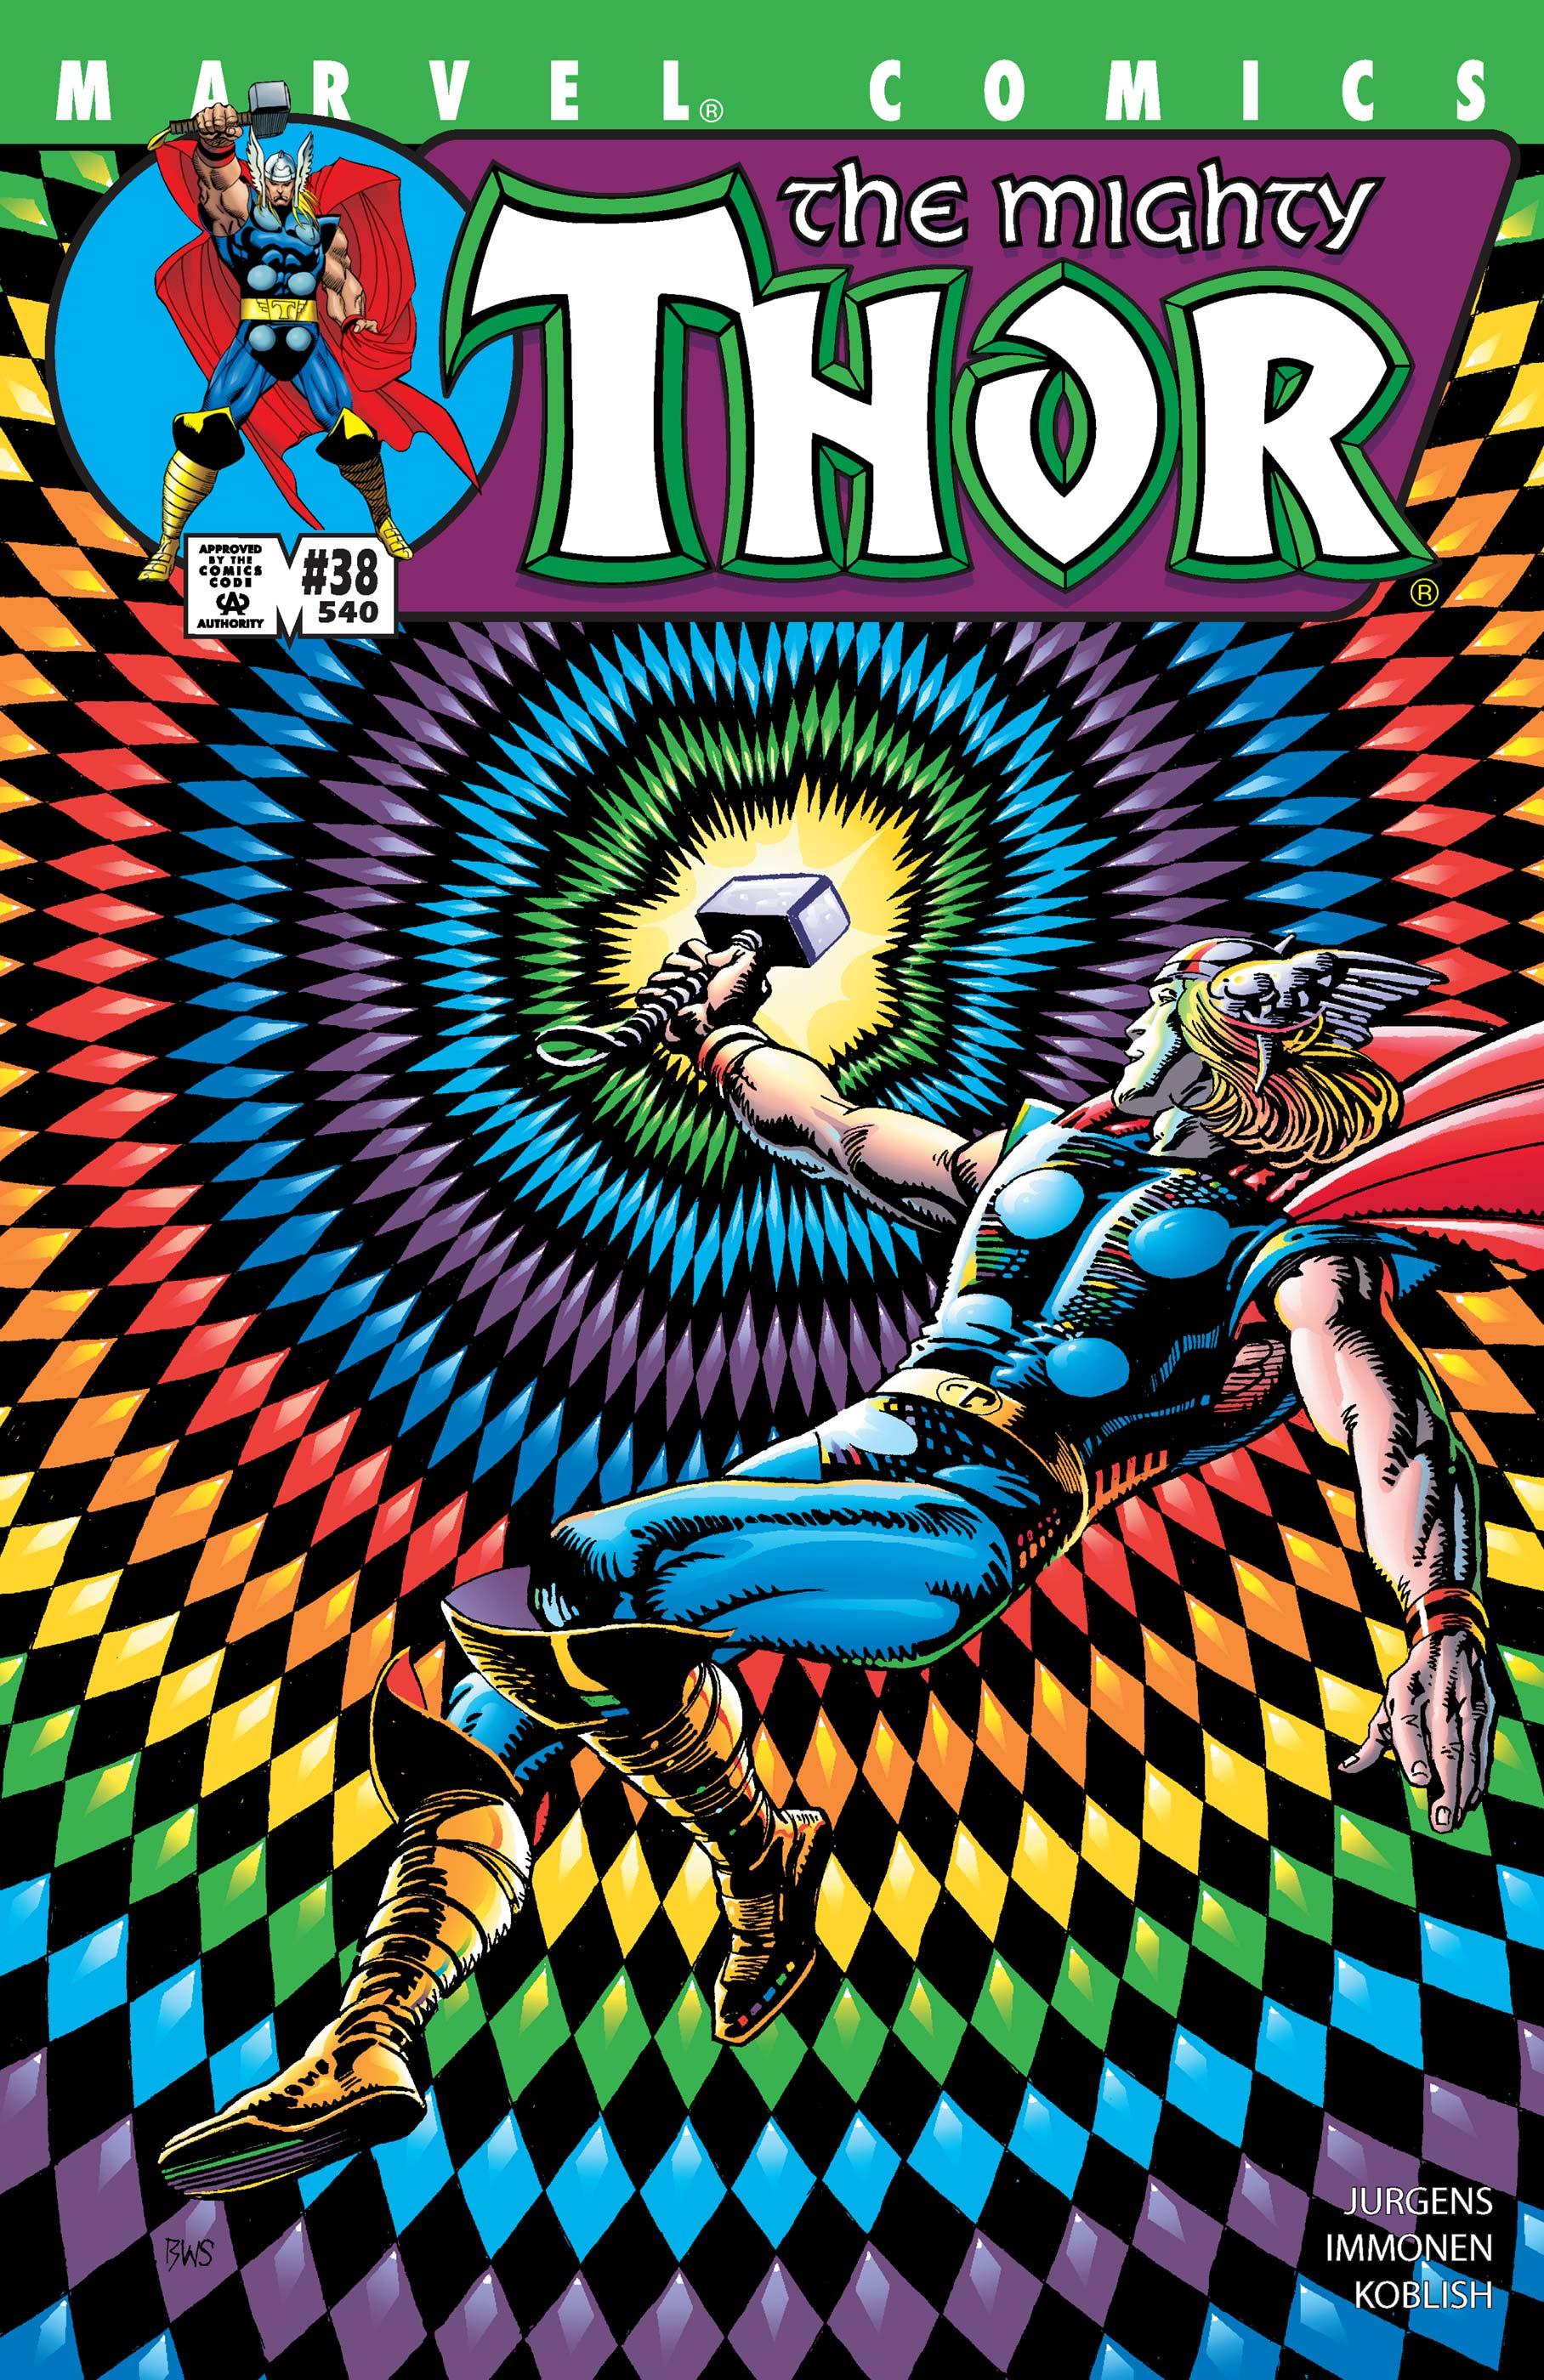 Thor (1998) #38